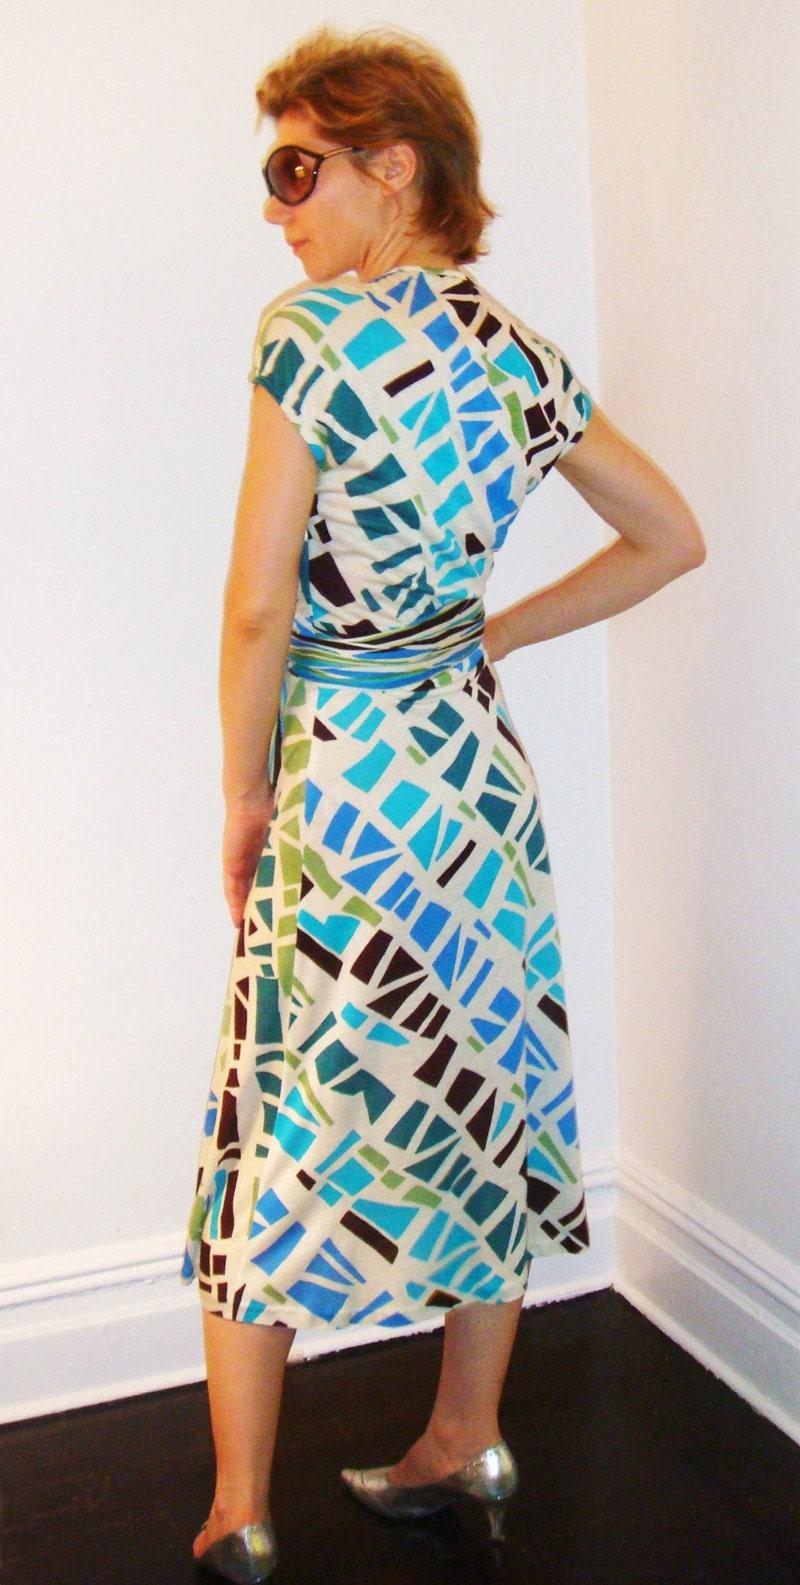 Azure Print V-Neck Dress - ON SALE